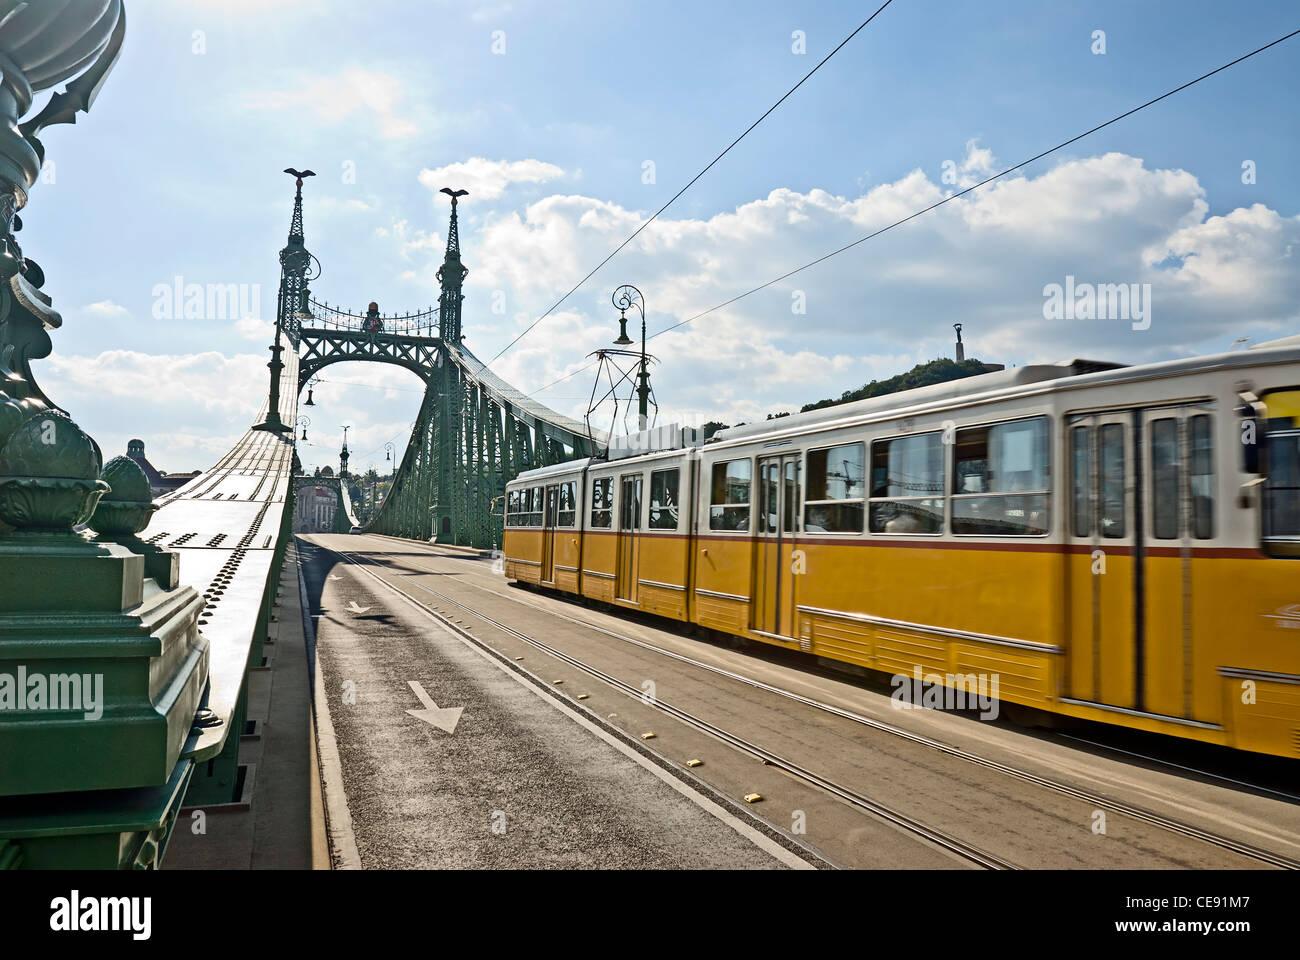 Tram on Liberty Bridge or Freedom Bridge (Szabadsag hid), Budapest, Hungary. Stock Photo